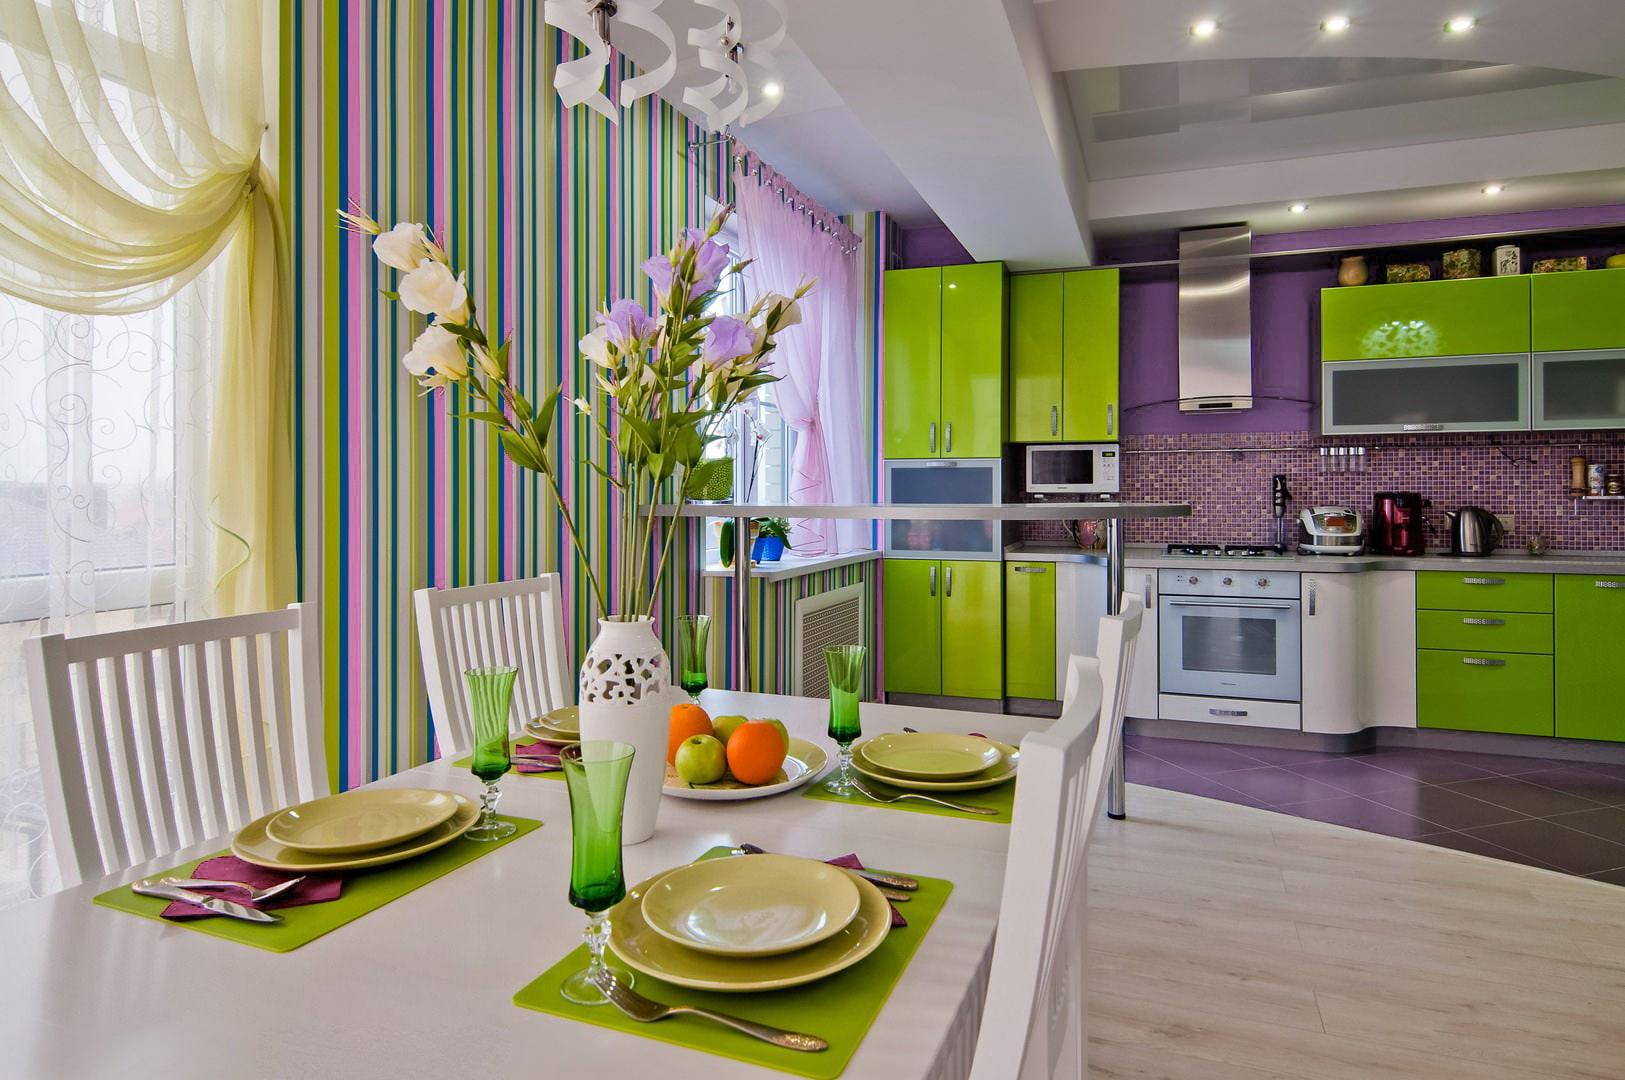 Кухня в ярких тонах дизайн фото